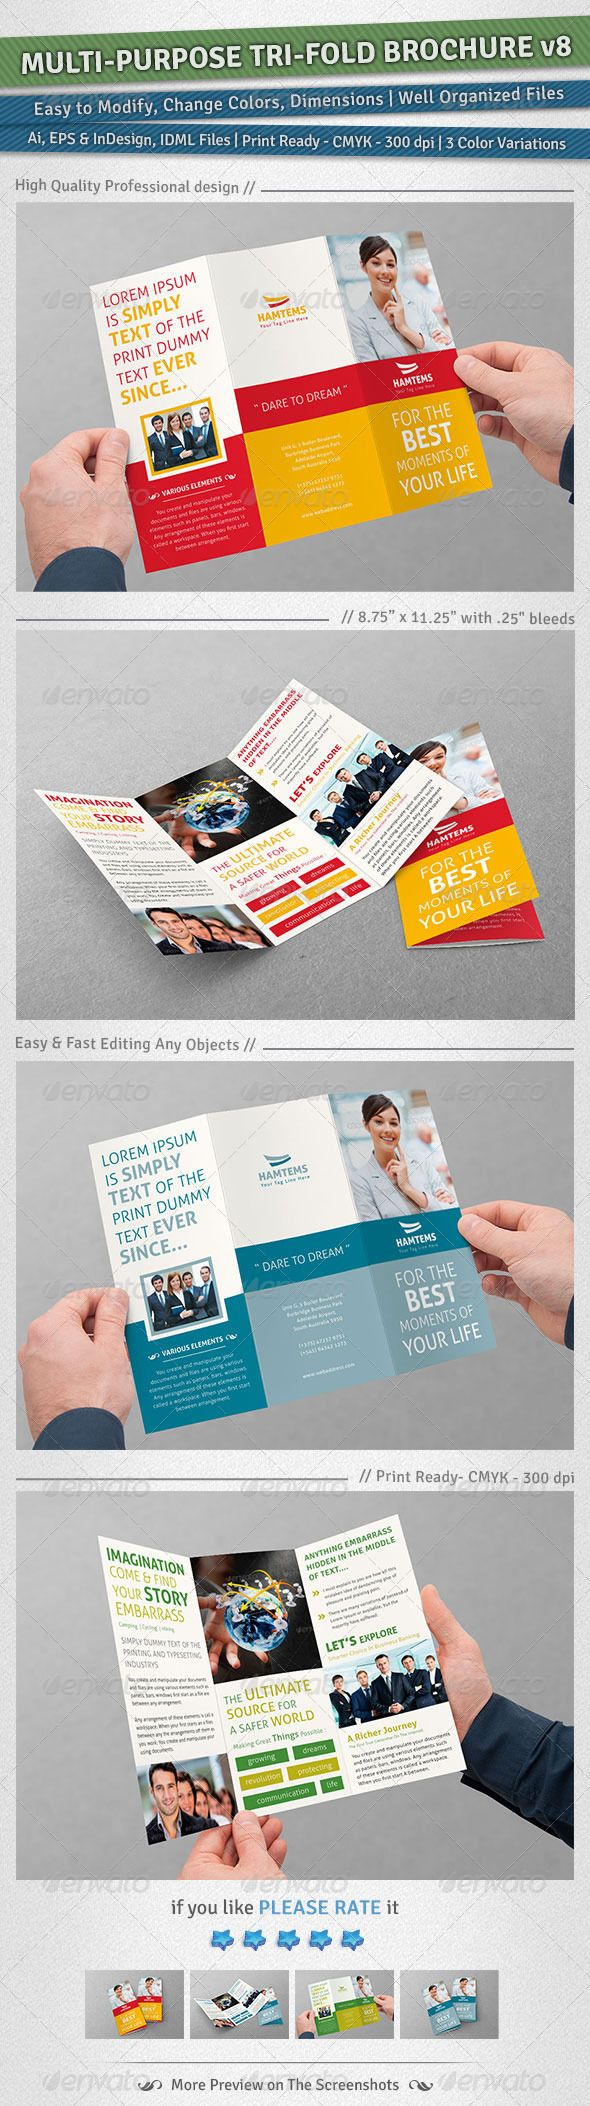 MultiPurpose TriFold Brochure  Volume   Tri Fold Brochure